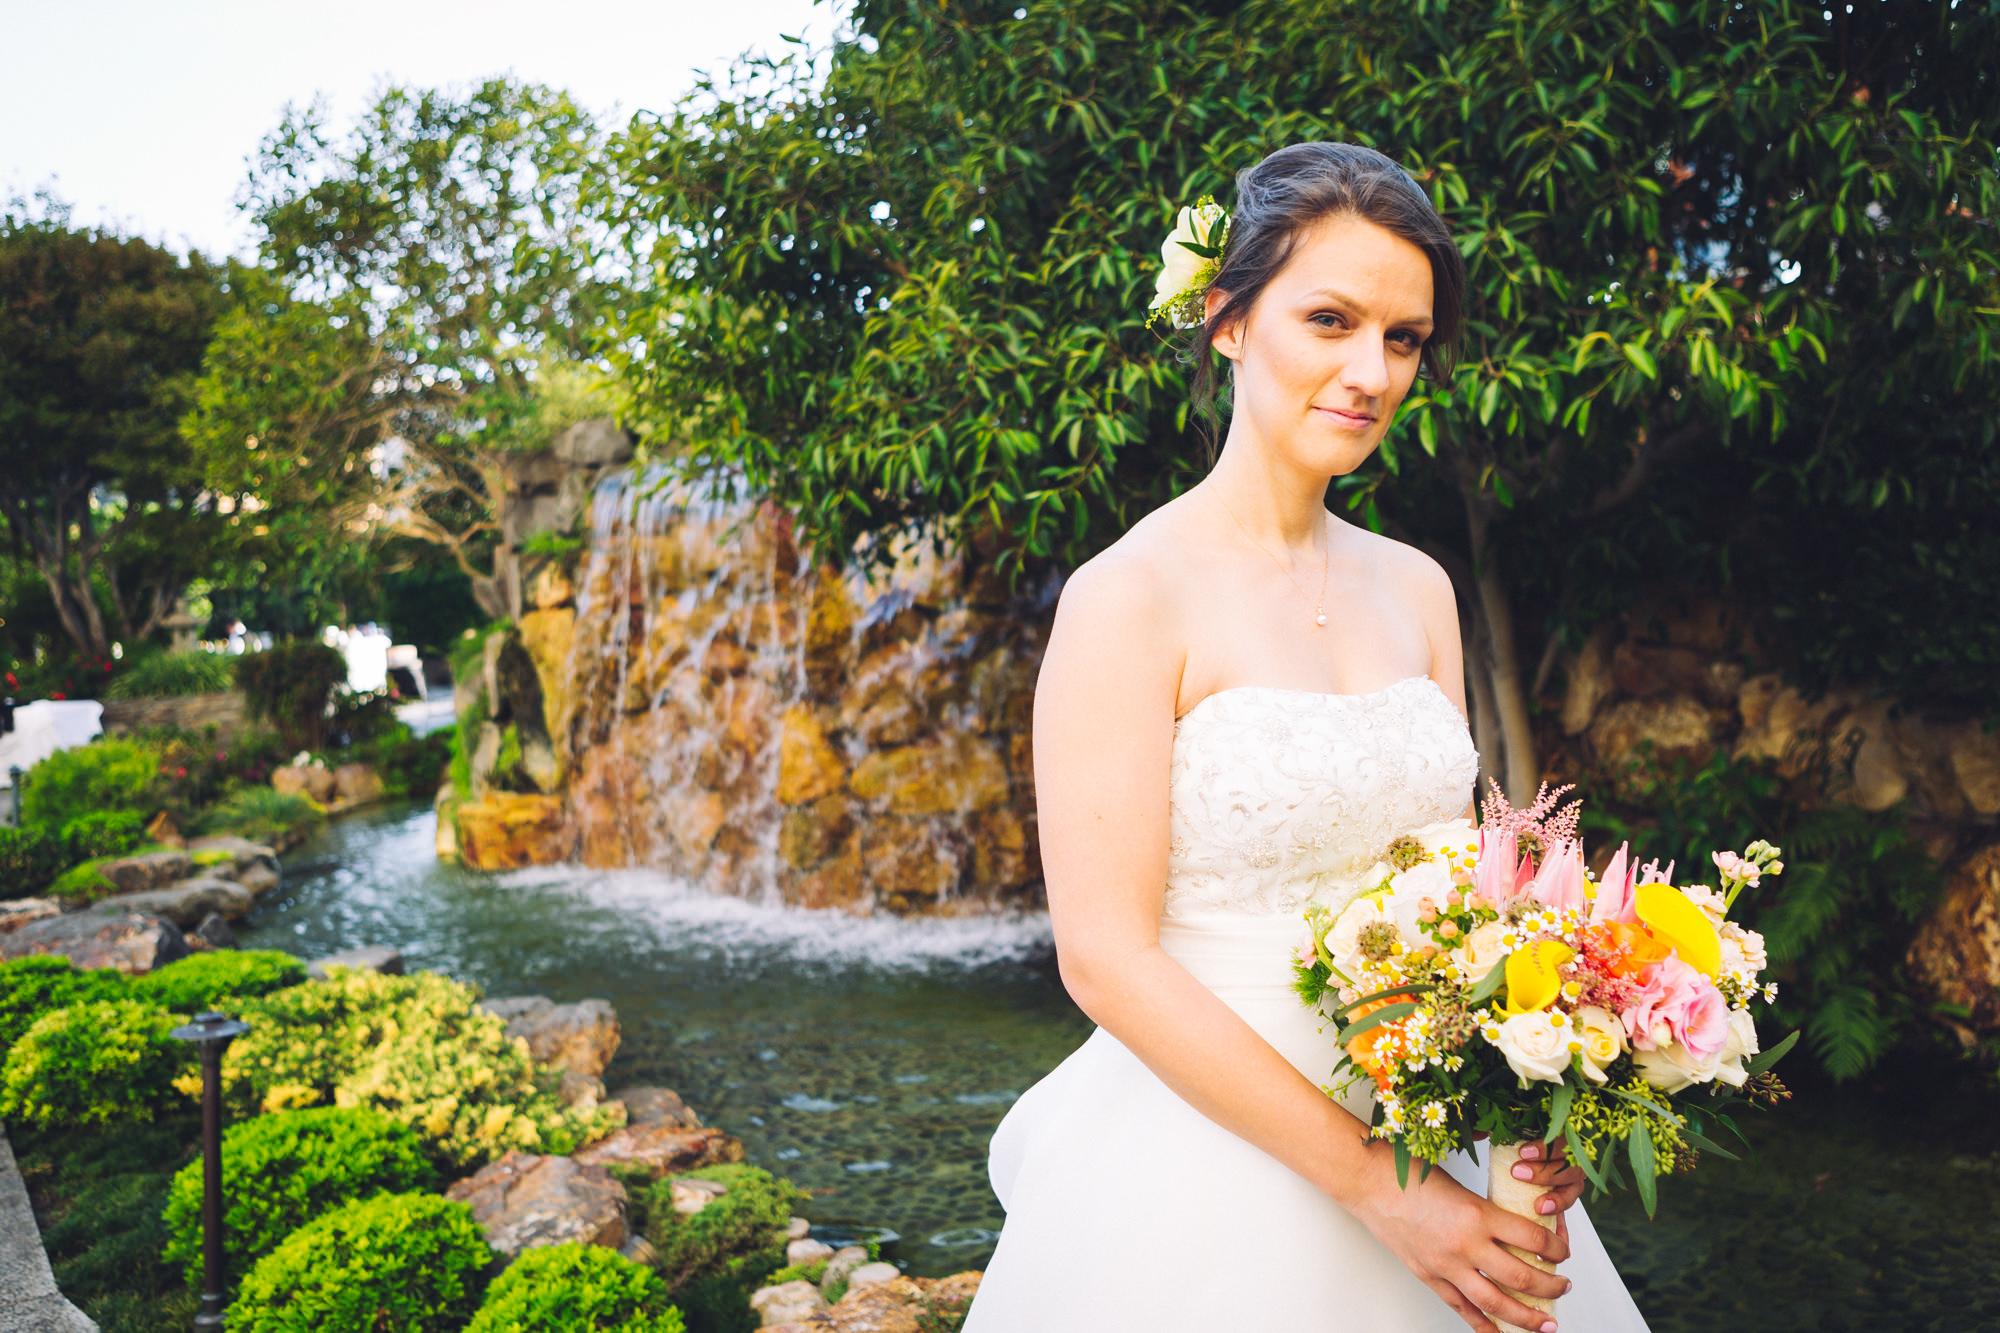 thelightandglass-wedding-engagement-photography-090.jpg